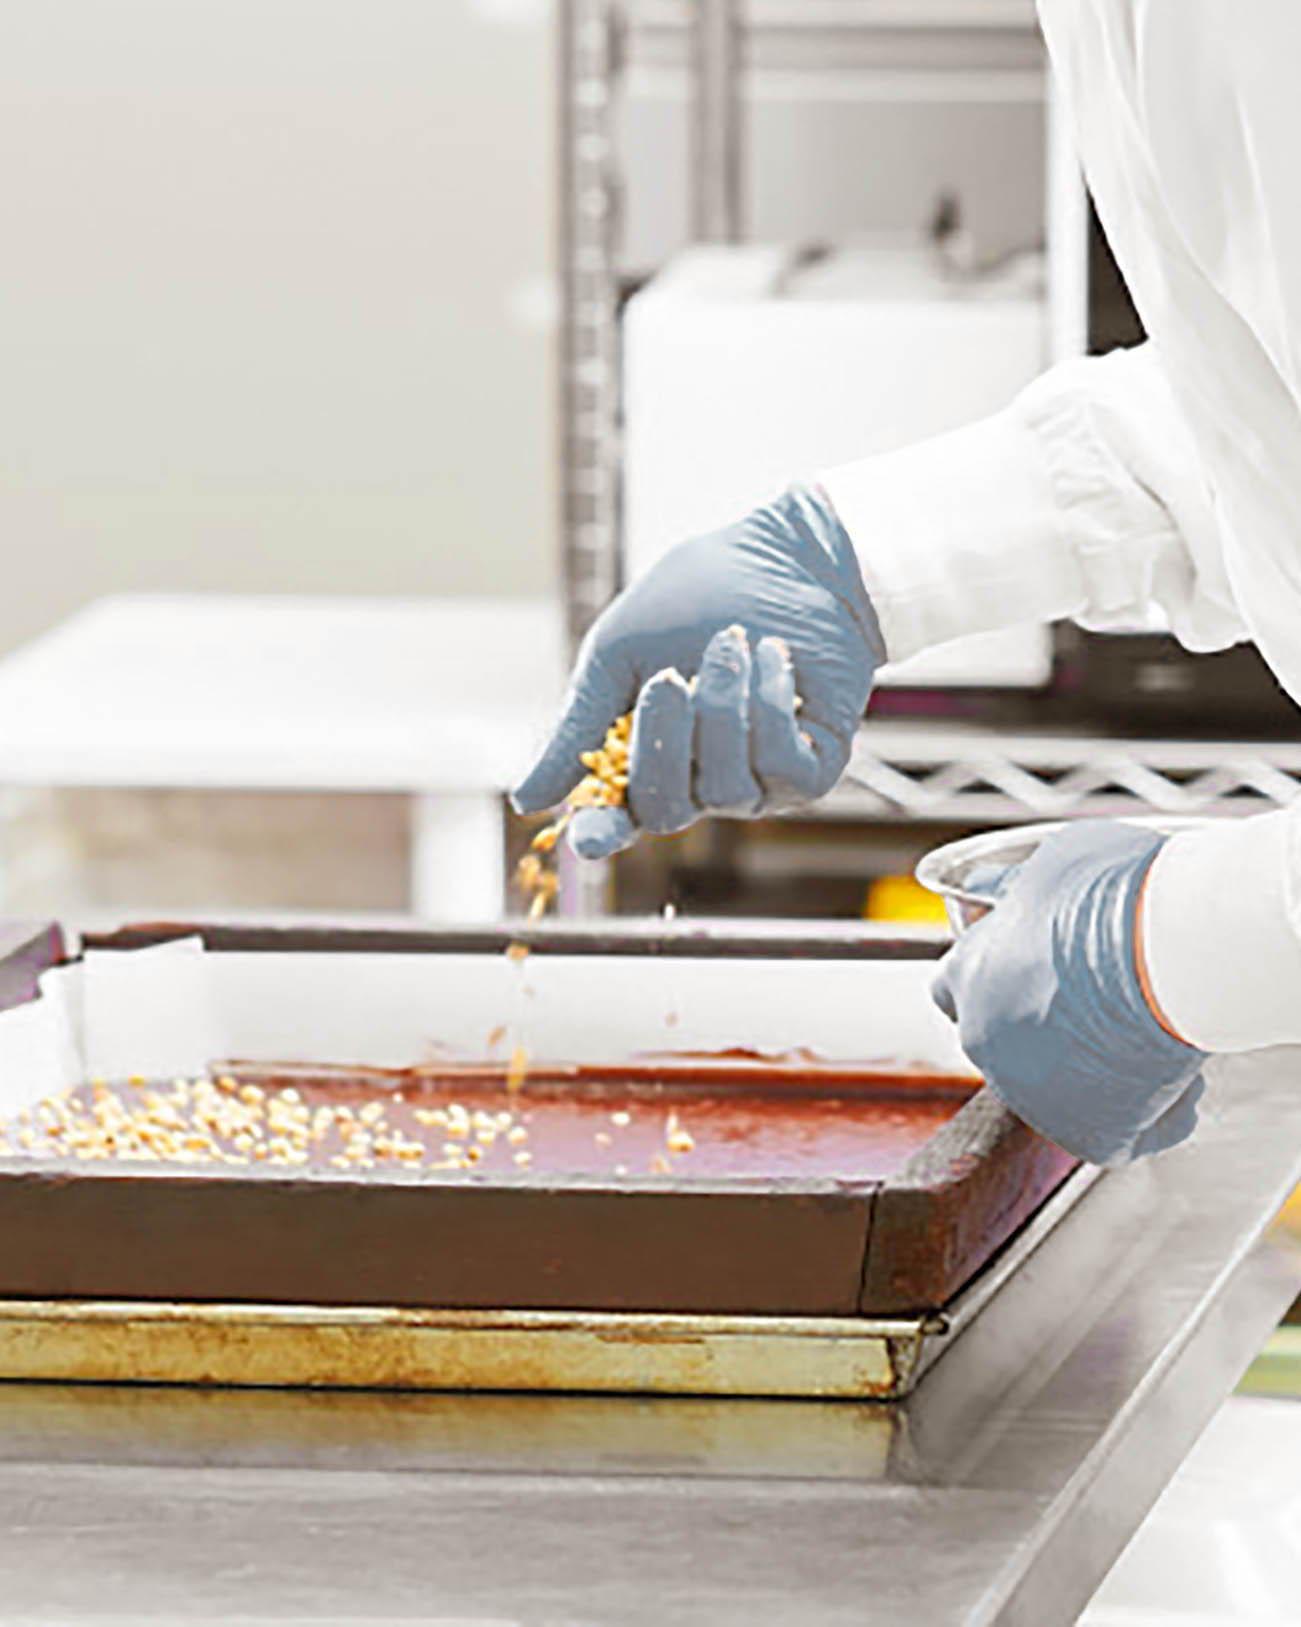 Nakajima Taishodo employee making Japanese sweets